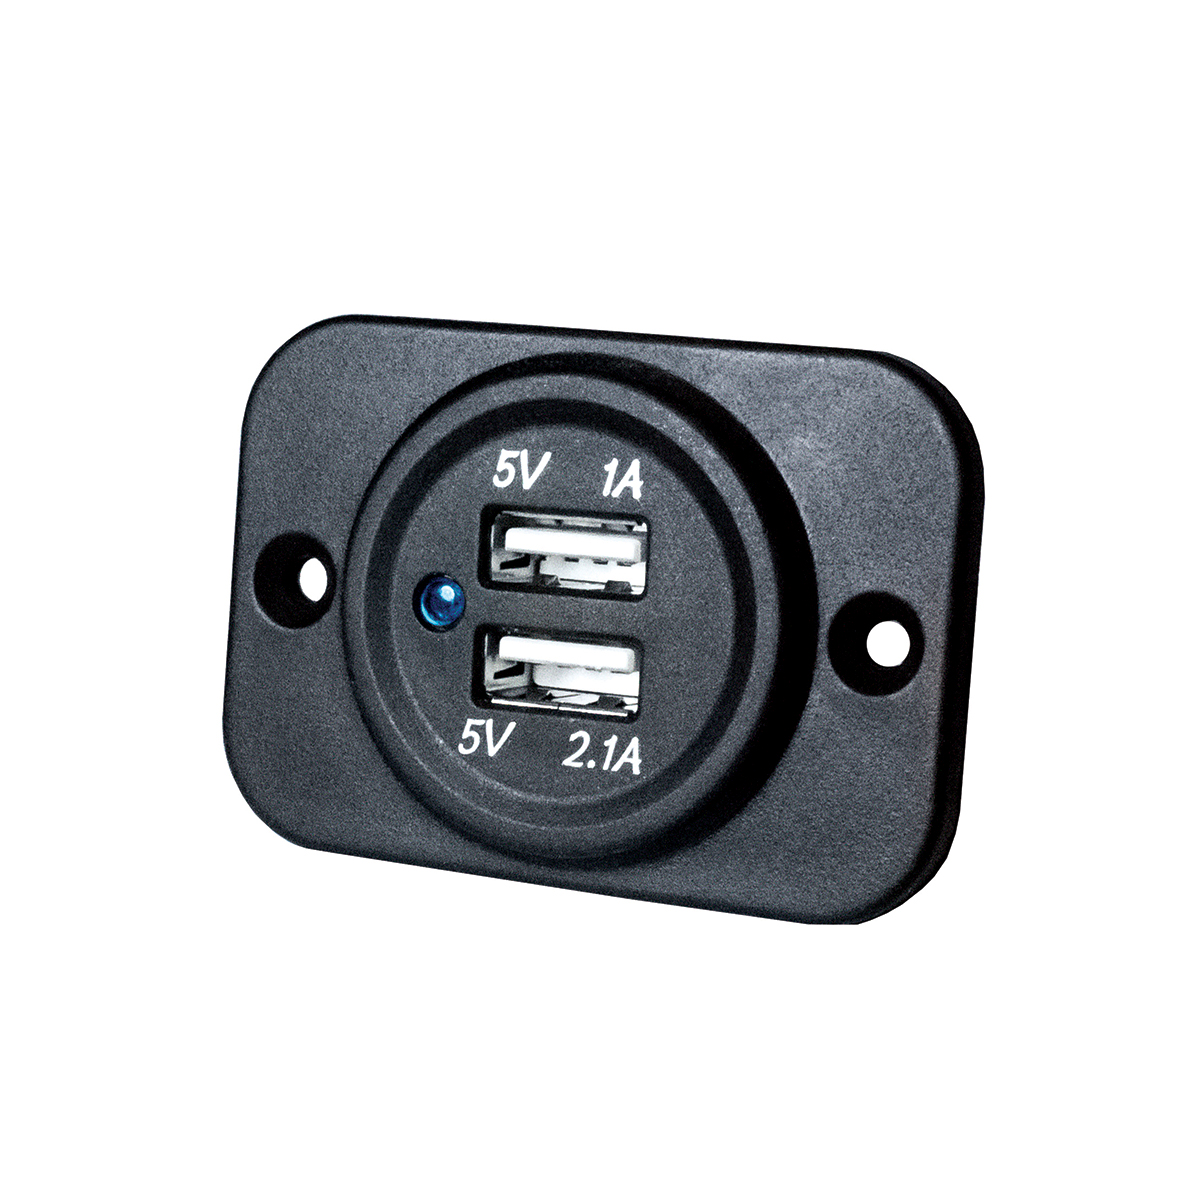 KT70501 - Dual USB Flush Mount (1 x 1A and 1 x 2A Plugs).jpg